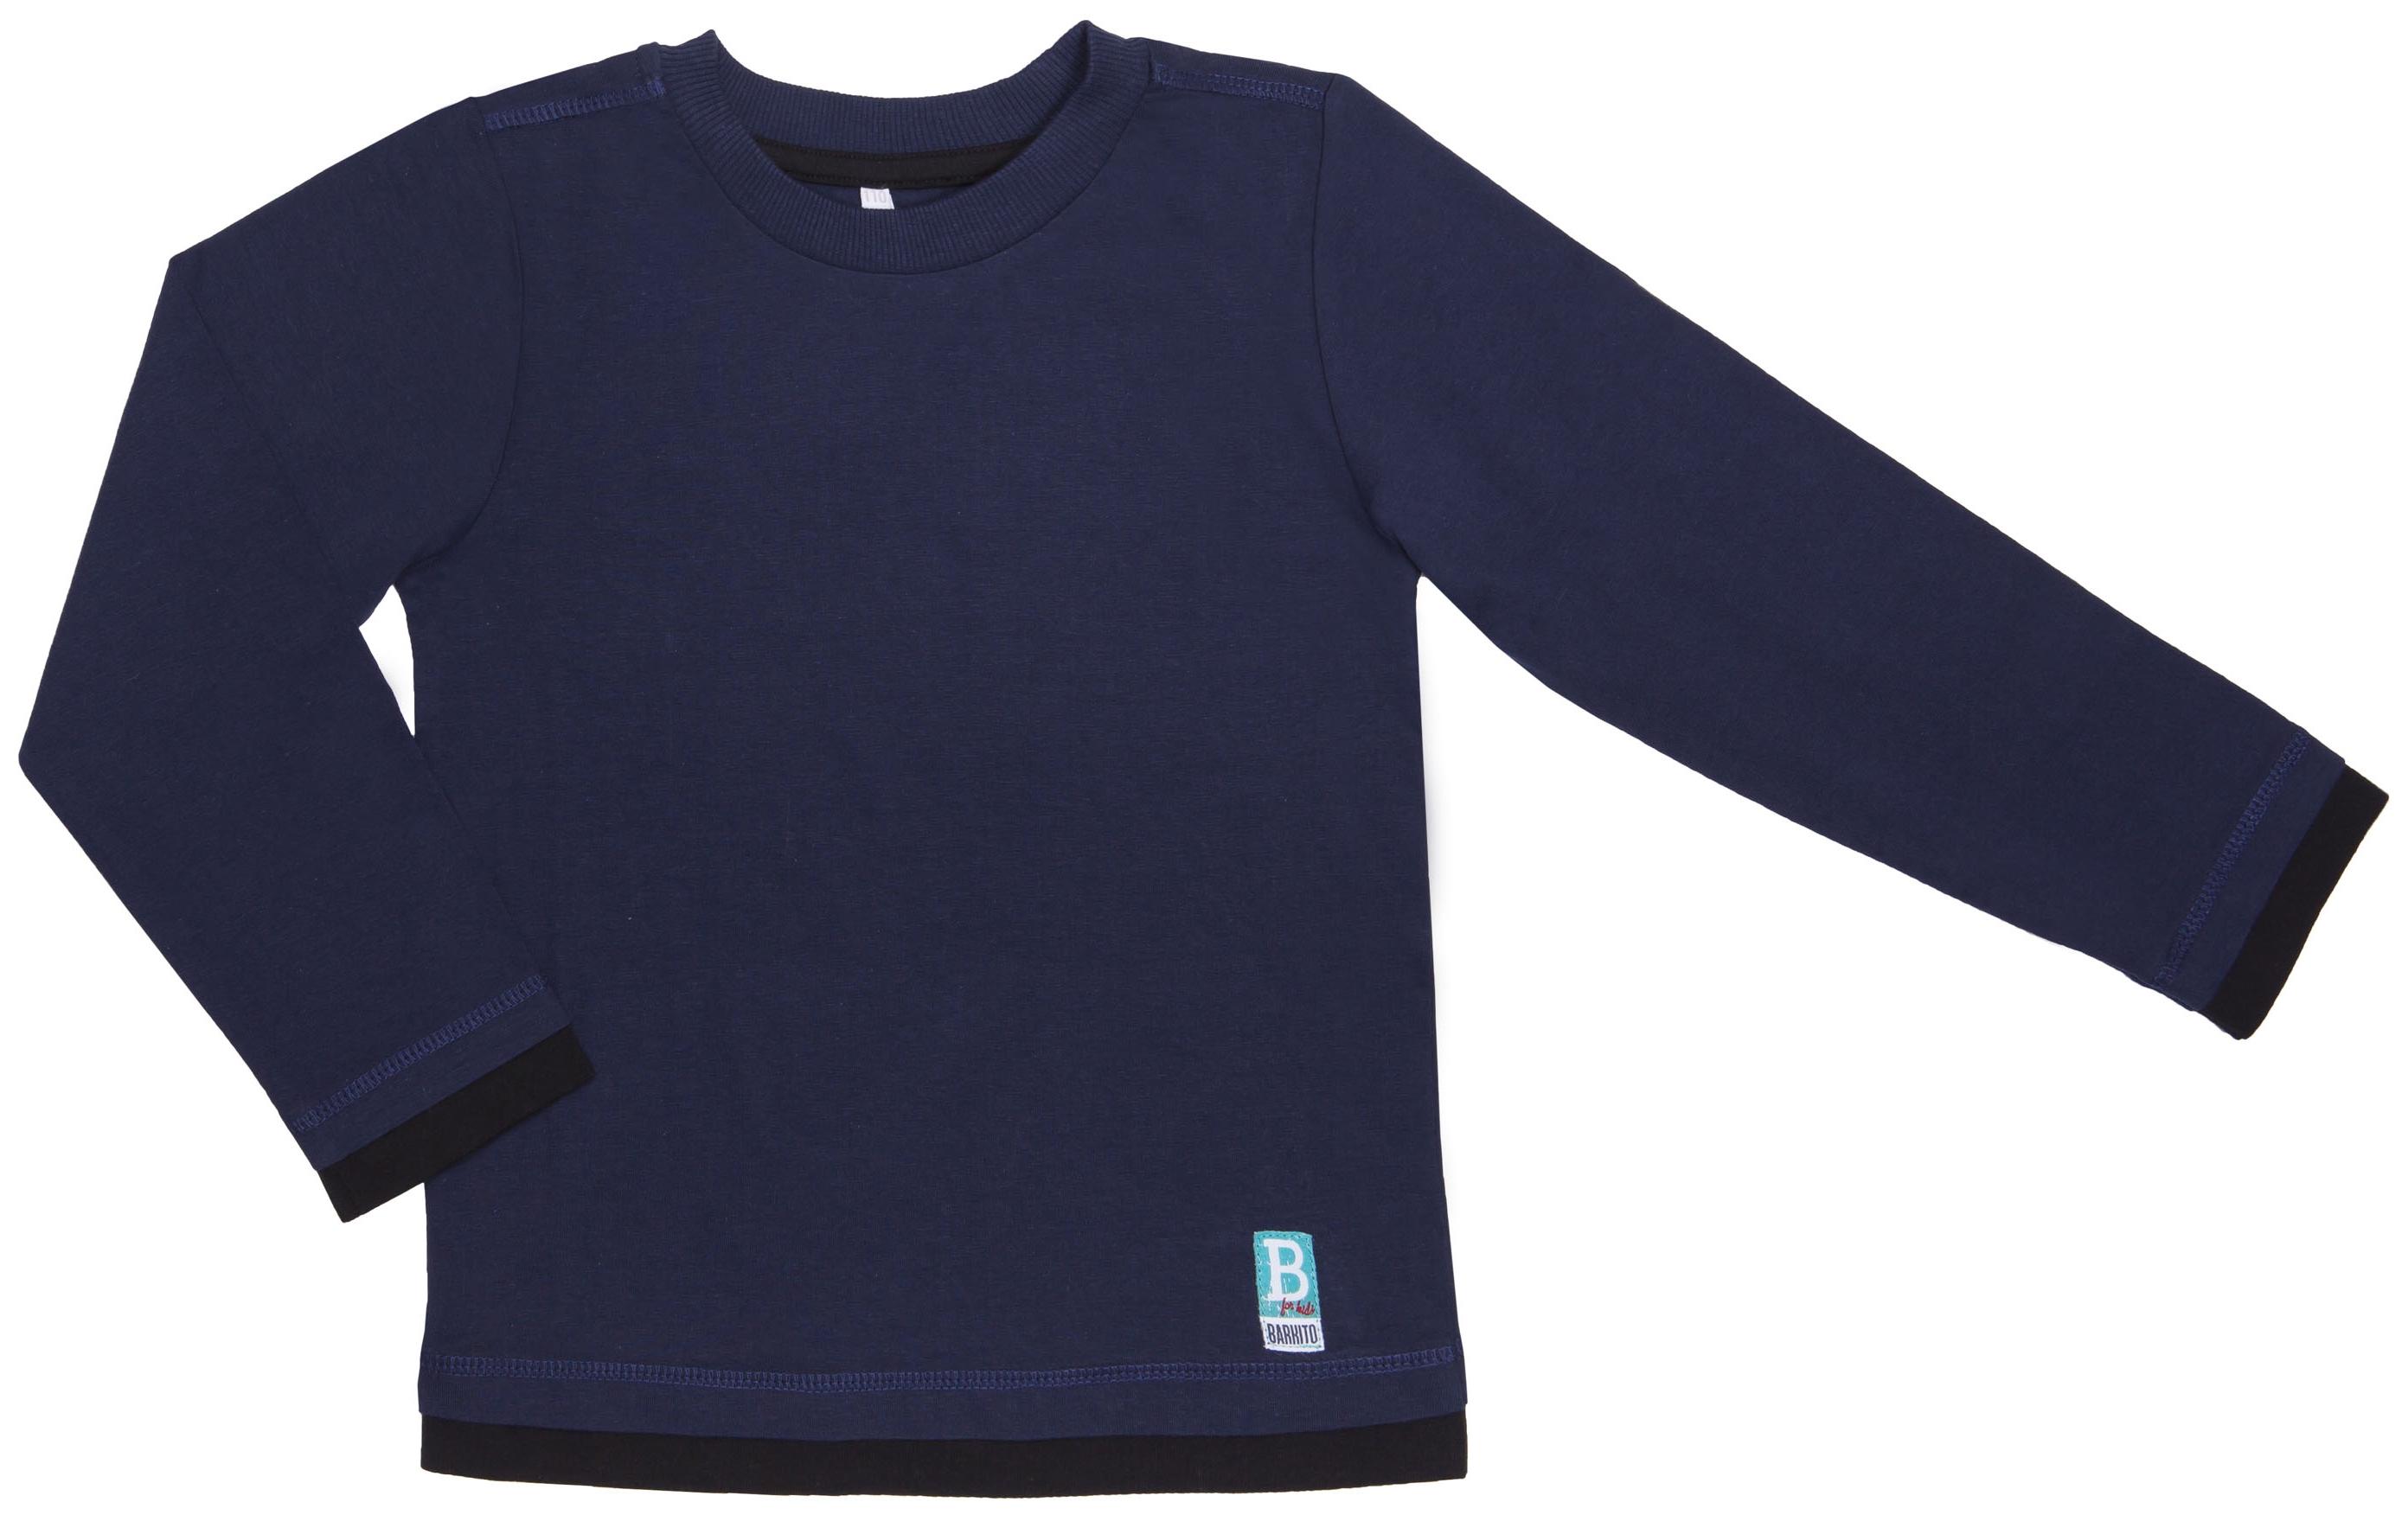 Футболки Barkito Футболка с длинным рукавом для мальчика Barkito, Мотоспорт, синяя футболки barkito футболка с длинным рукавом для мальчика barkito монстр трак синяя